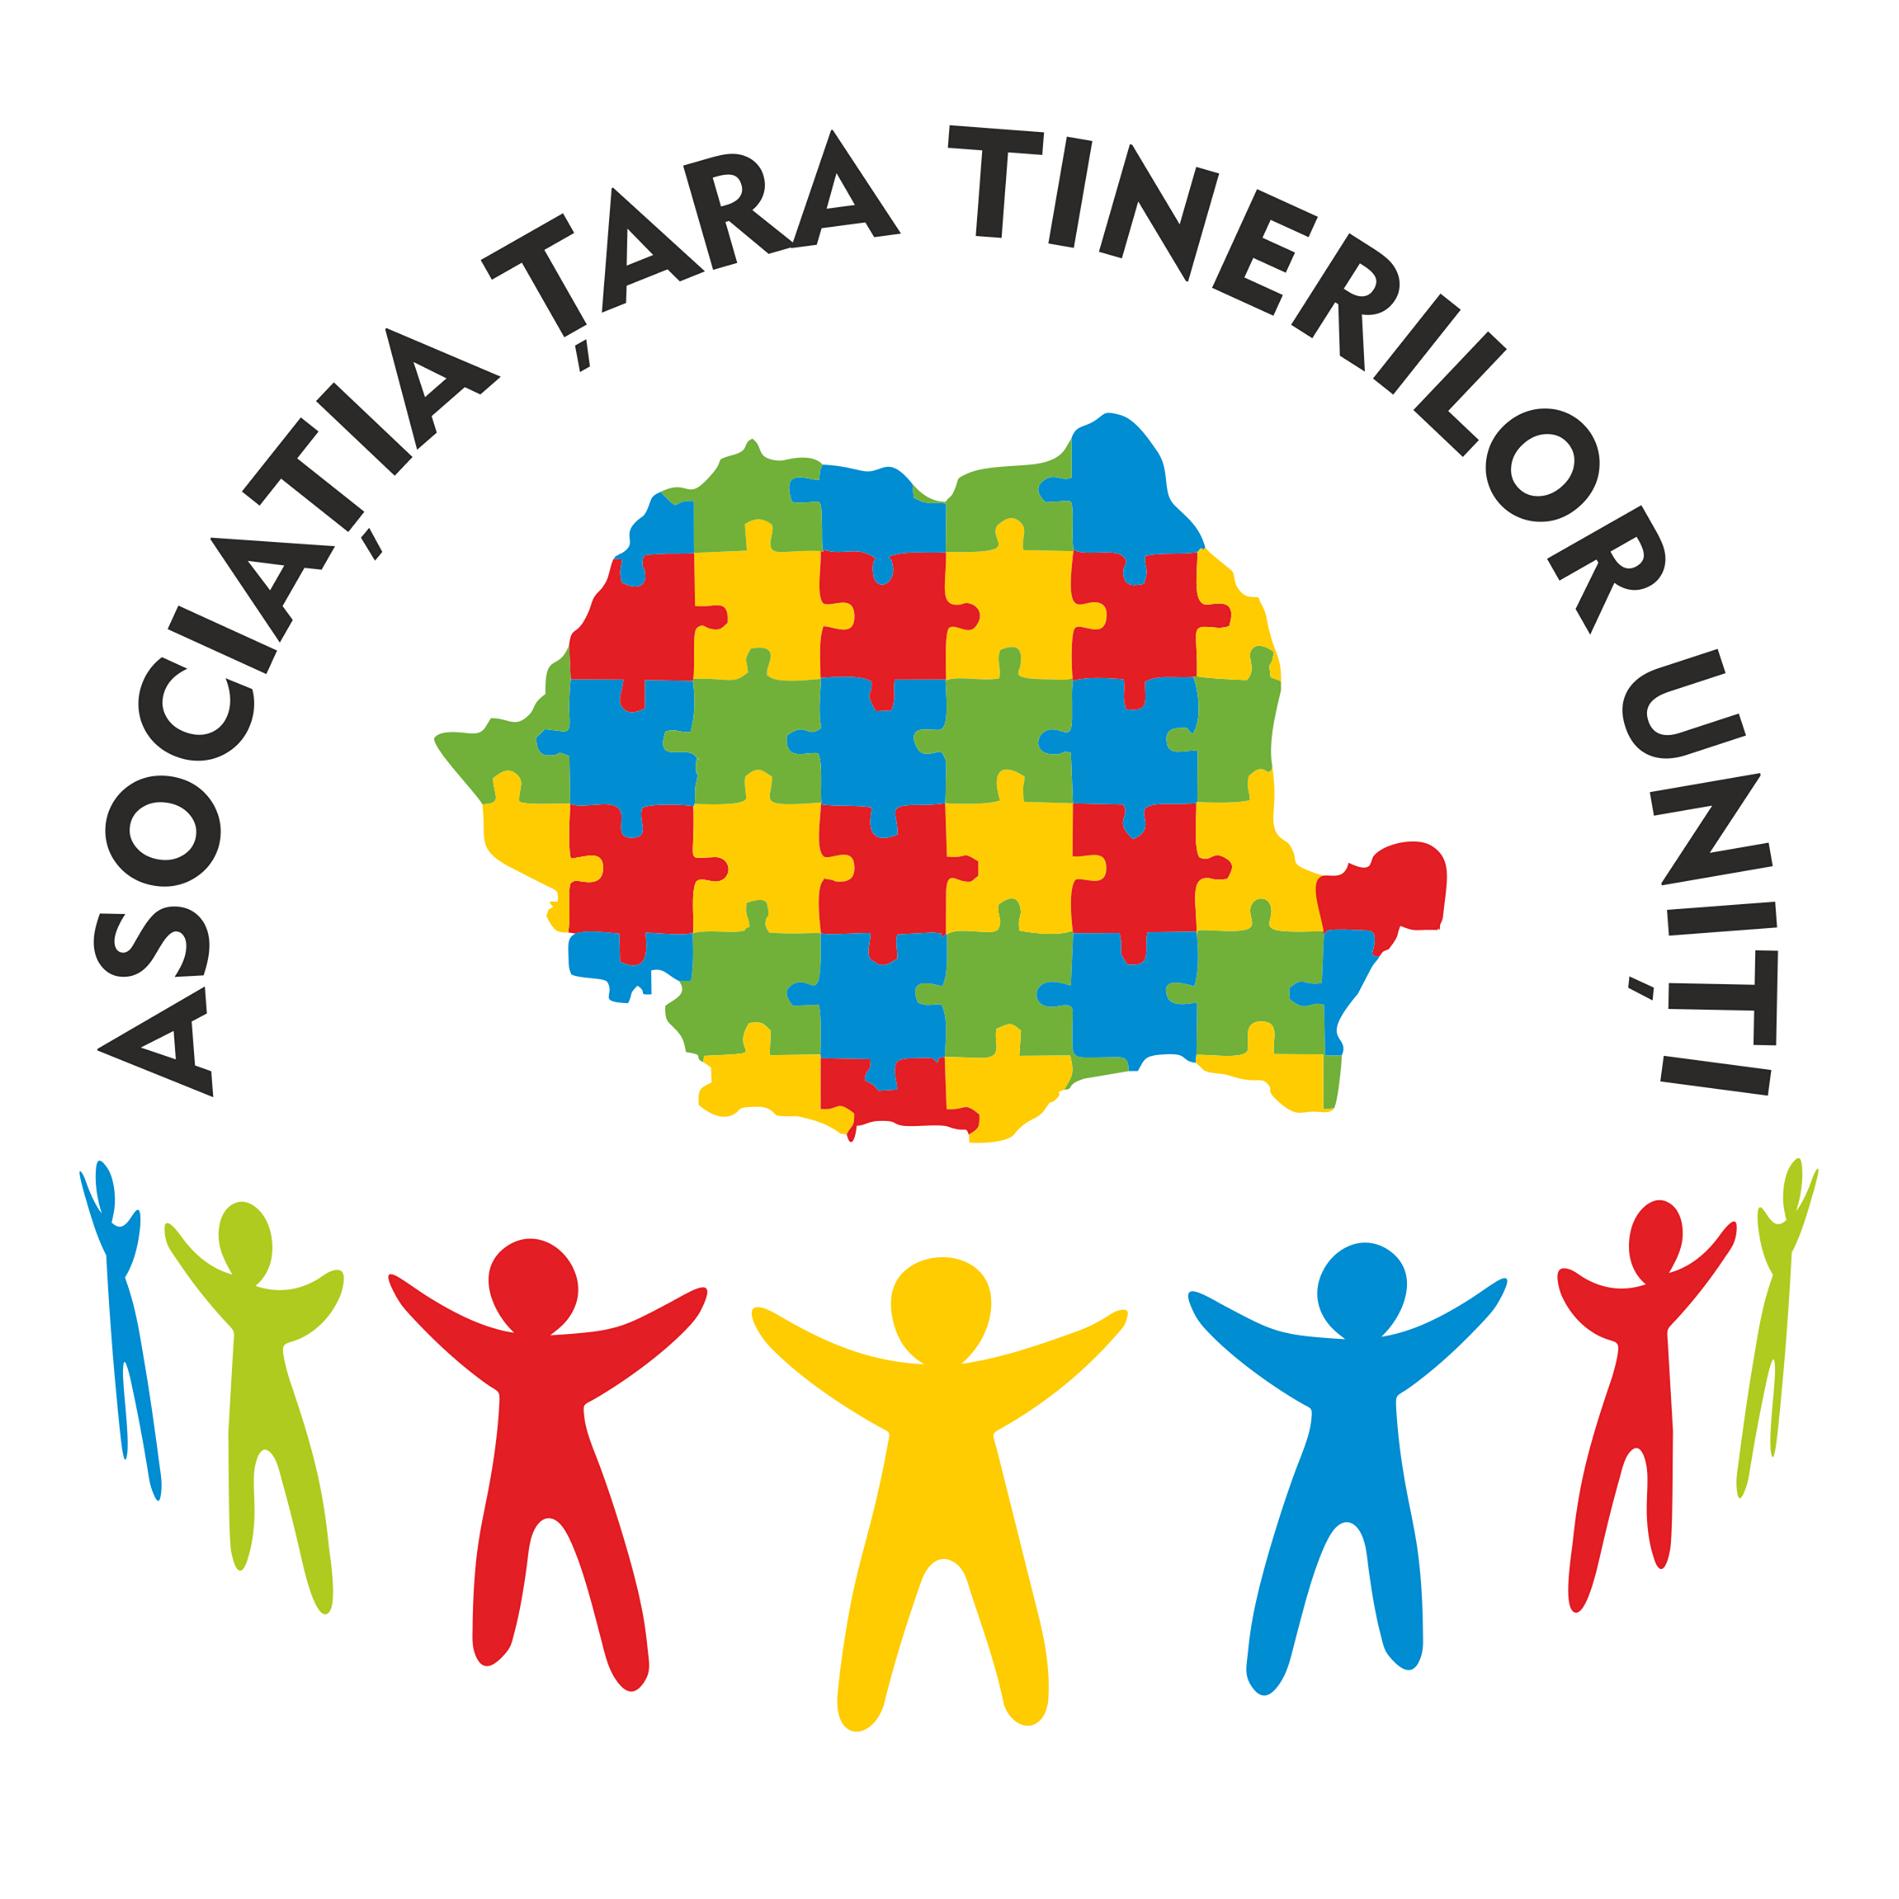 Asociația Țara Tinerilor Uniți logo